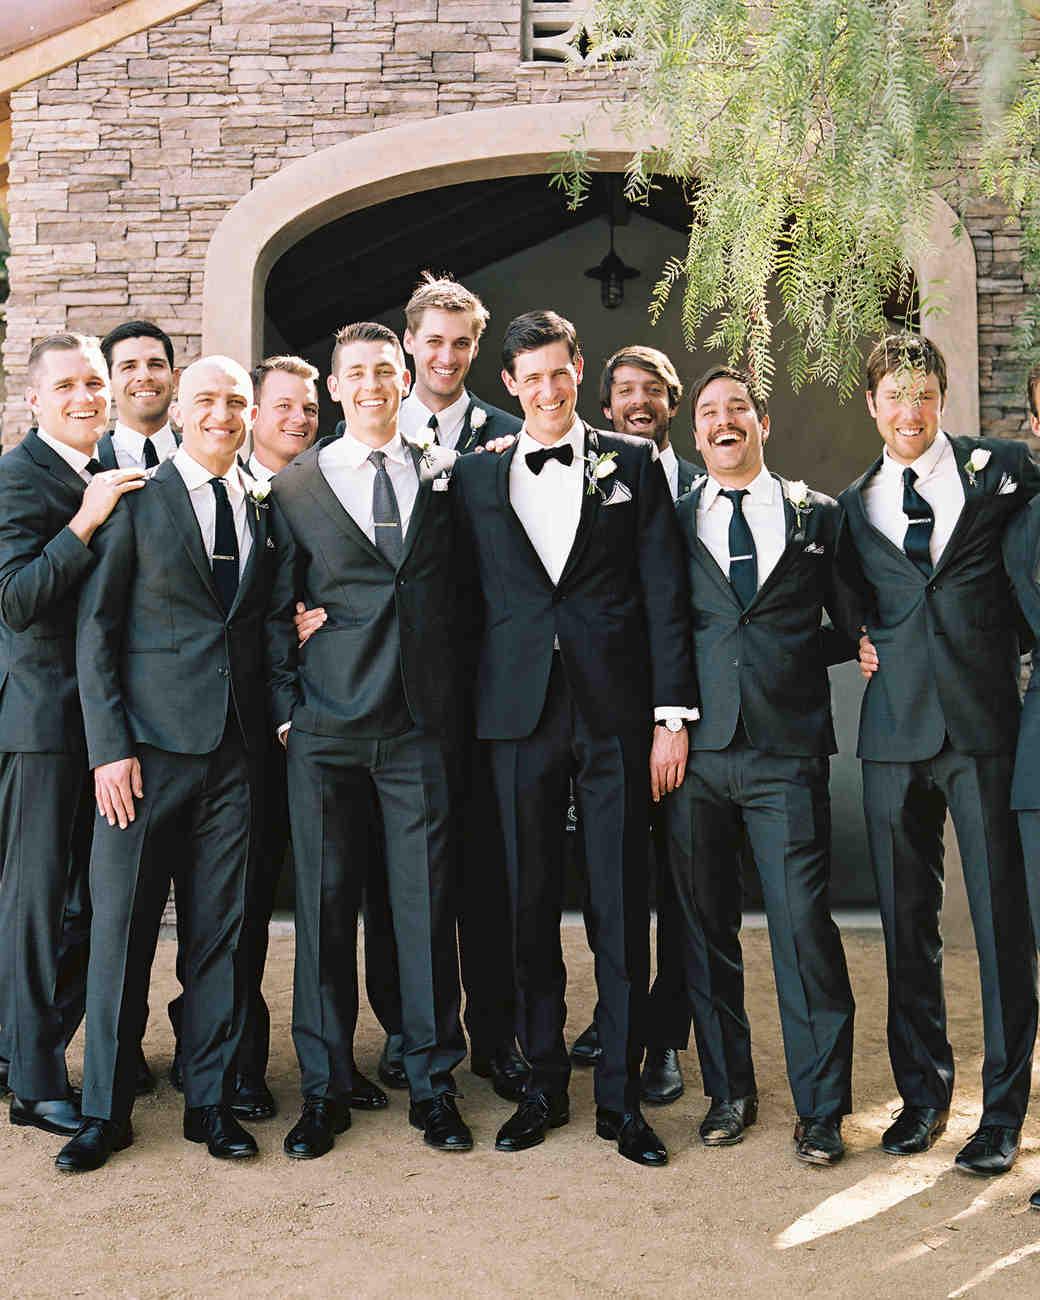 brooke-shea-wedding-029-d111277.jpg